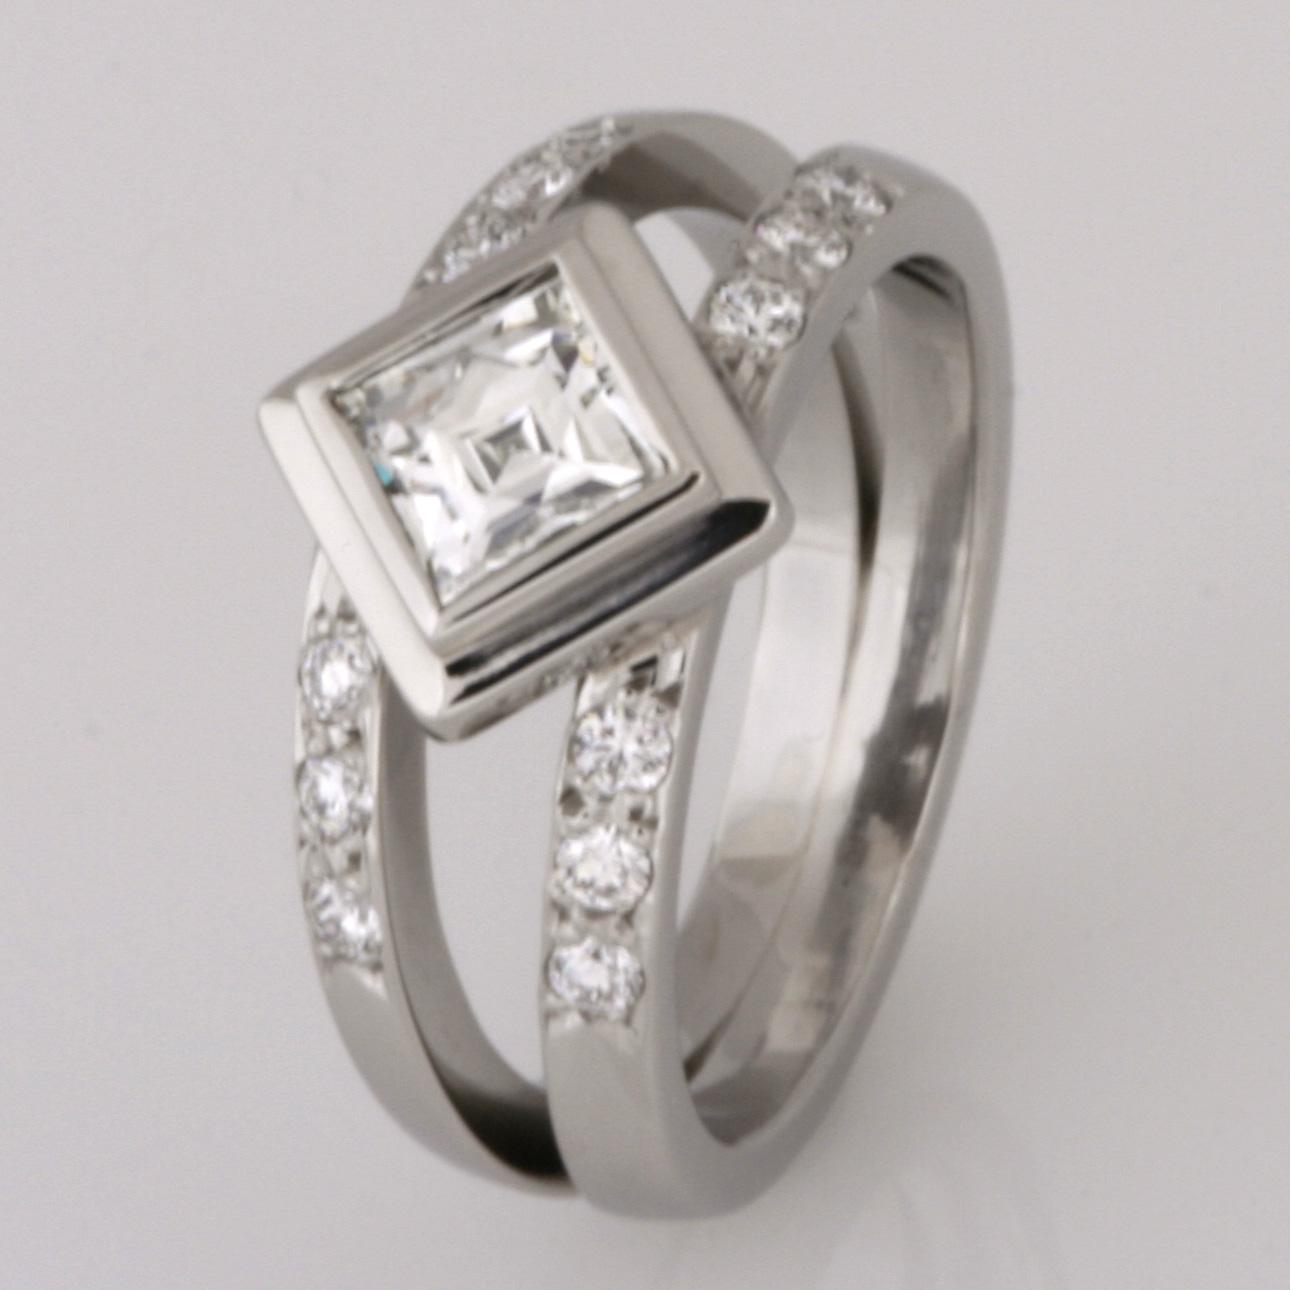 "Handmade palladium ""Square Tycoon"" cut diamond engagement ring"